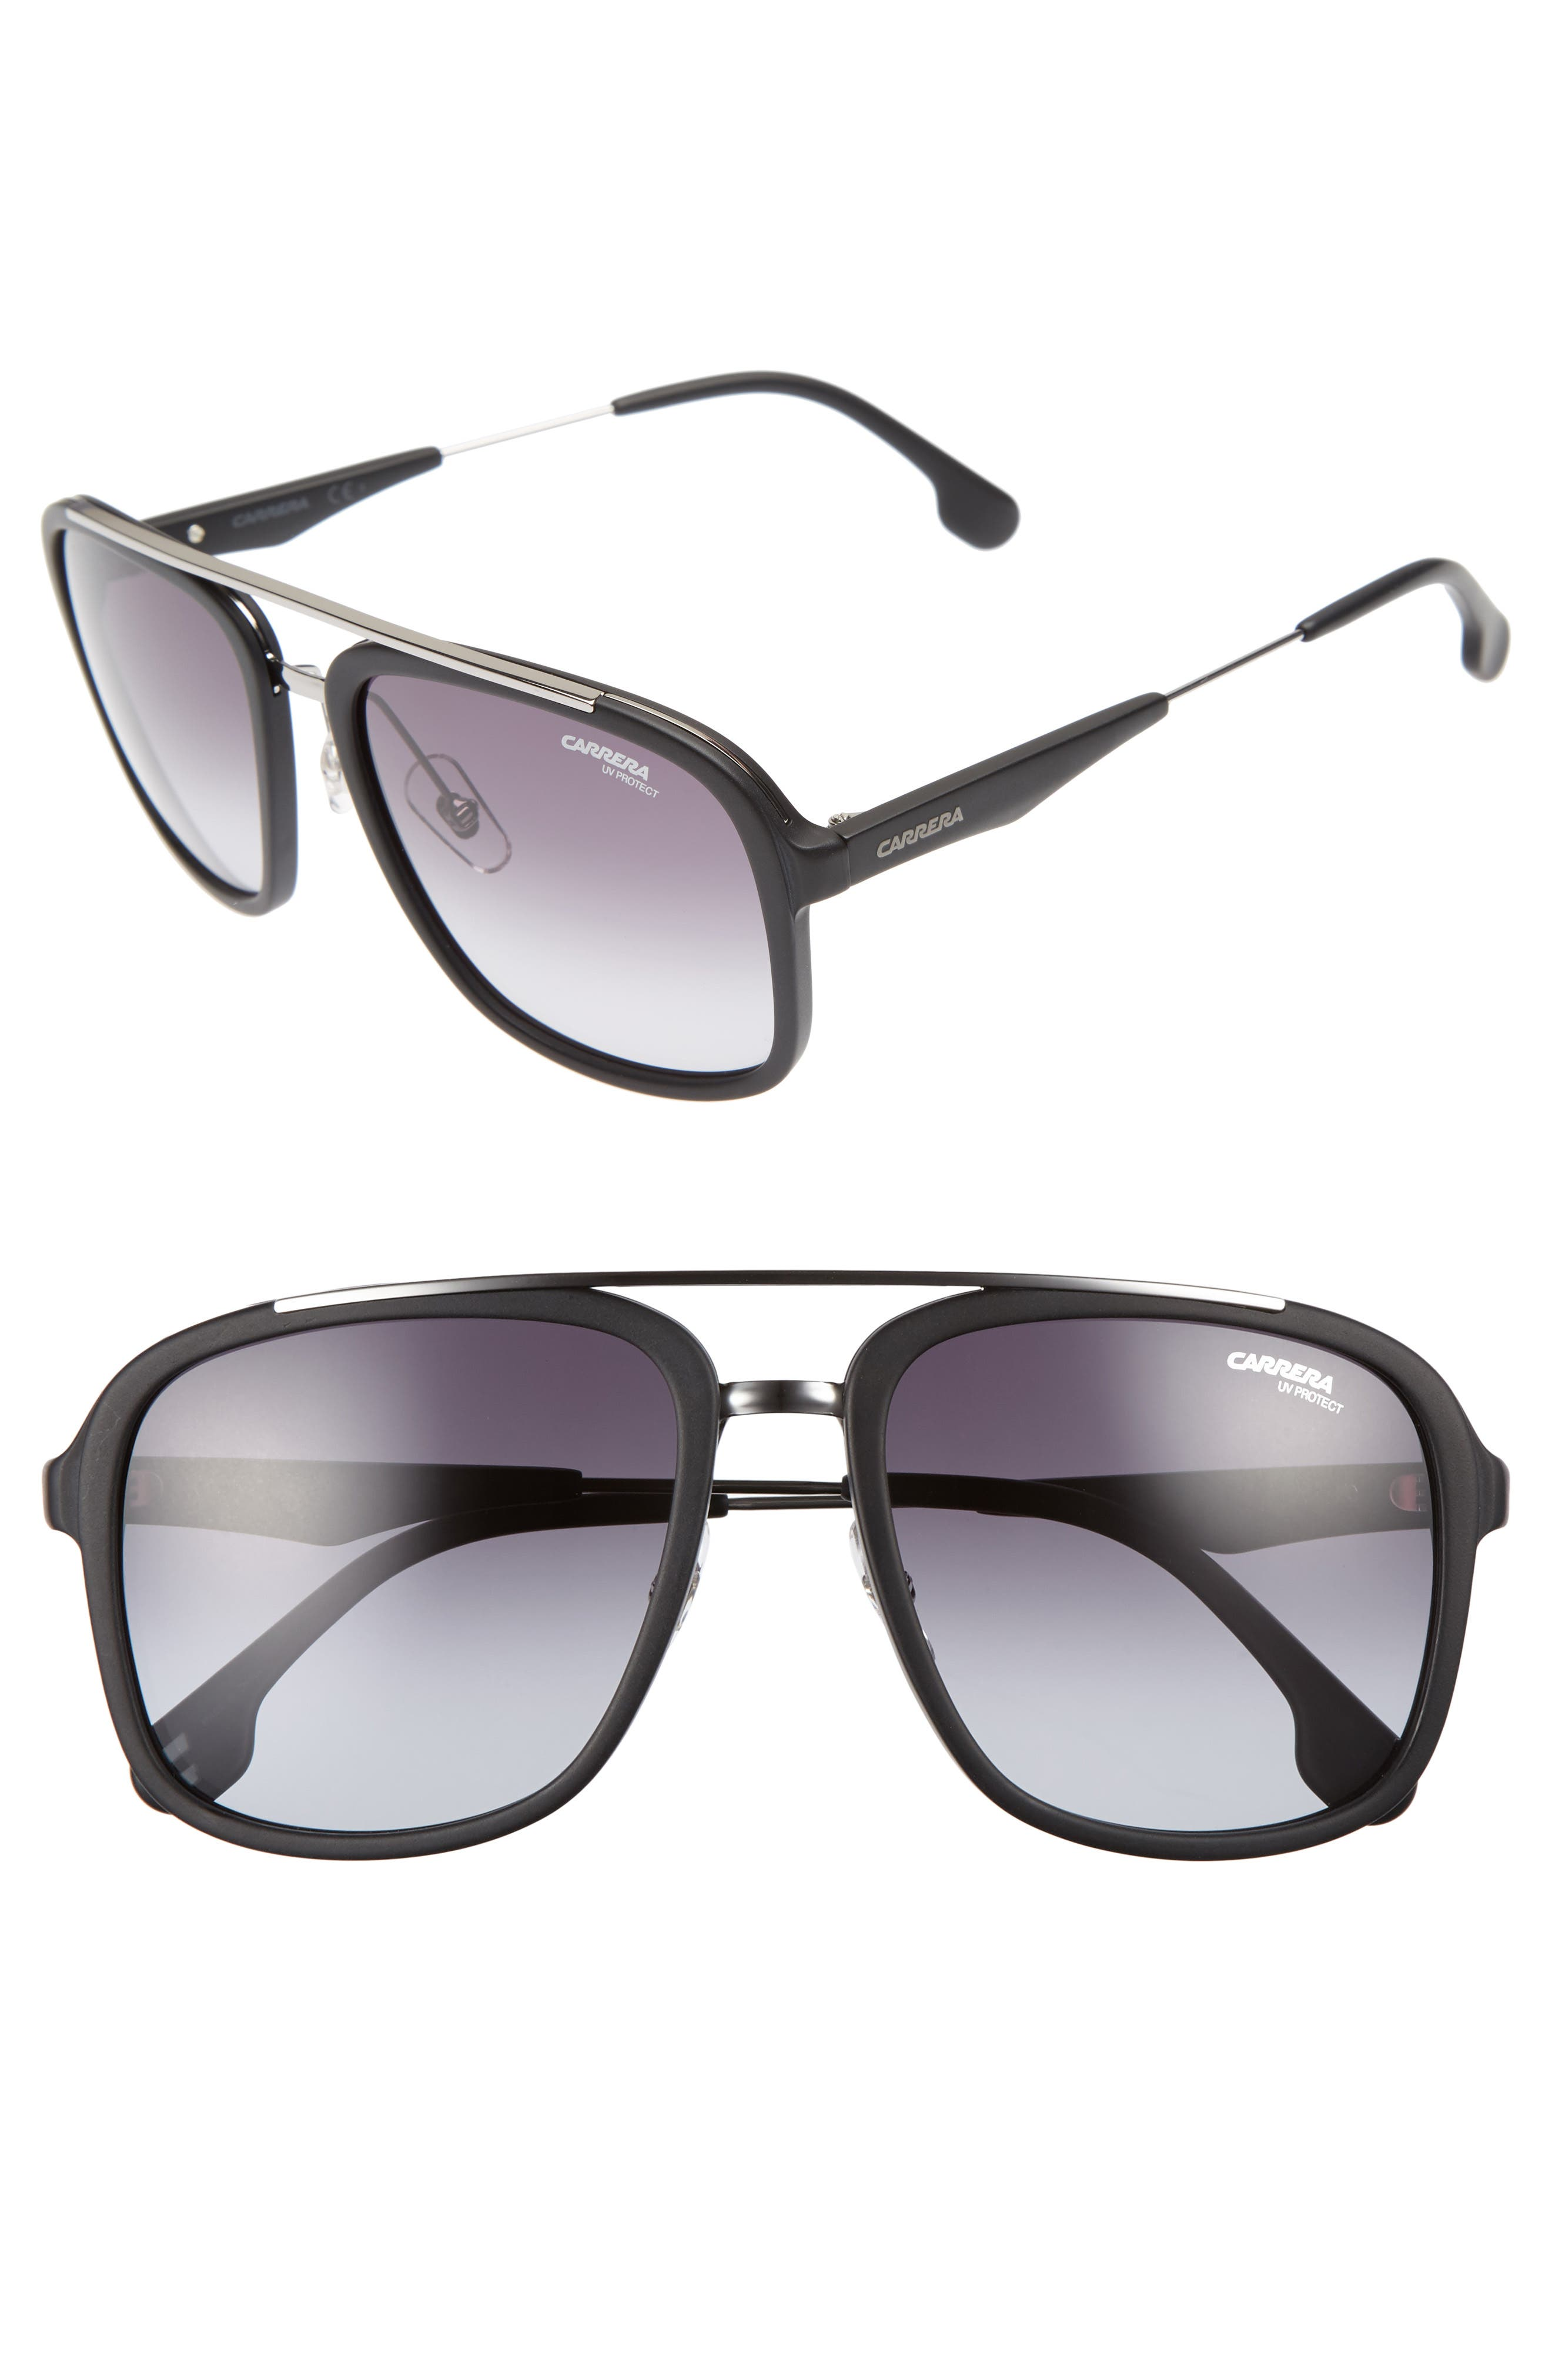 57mm Sunglasses,                             Main thumbnail 1, color,                             MATTE DARK RUTHENIUM